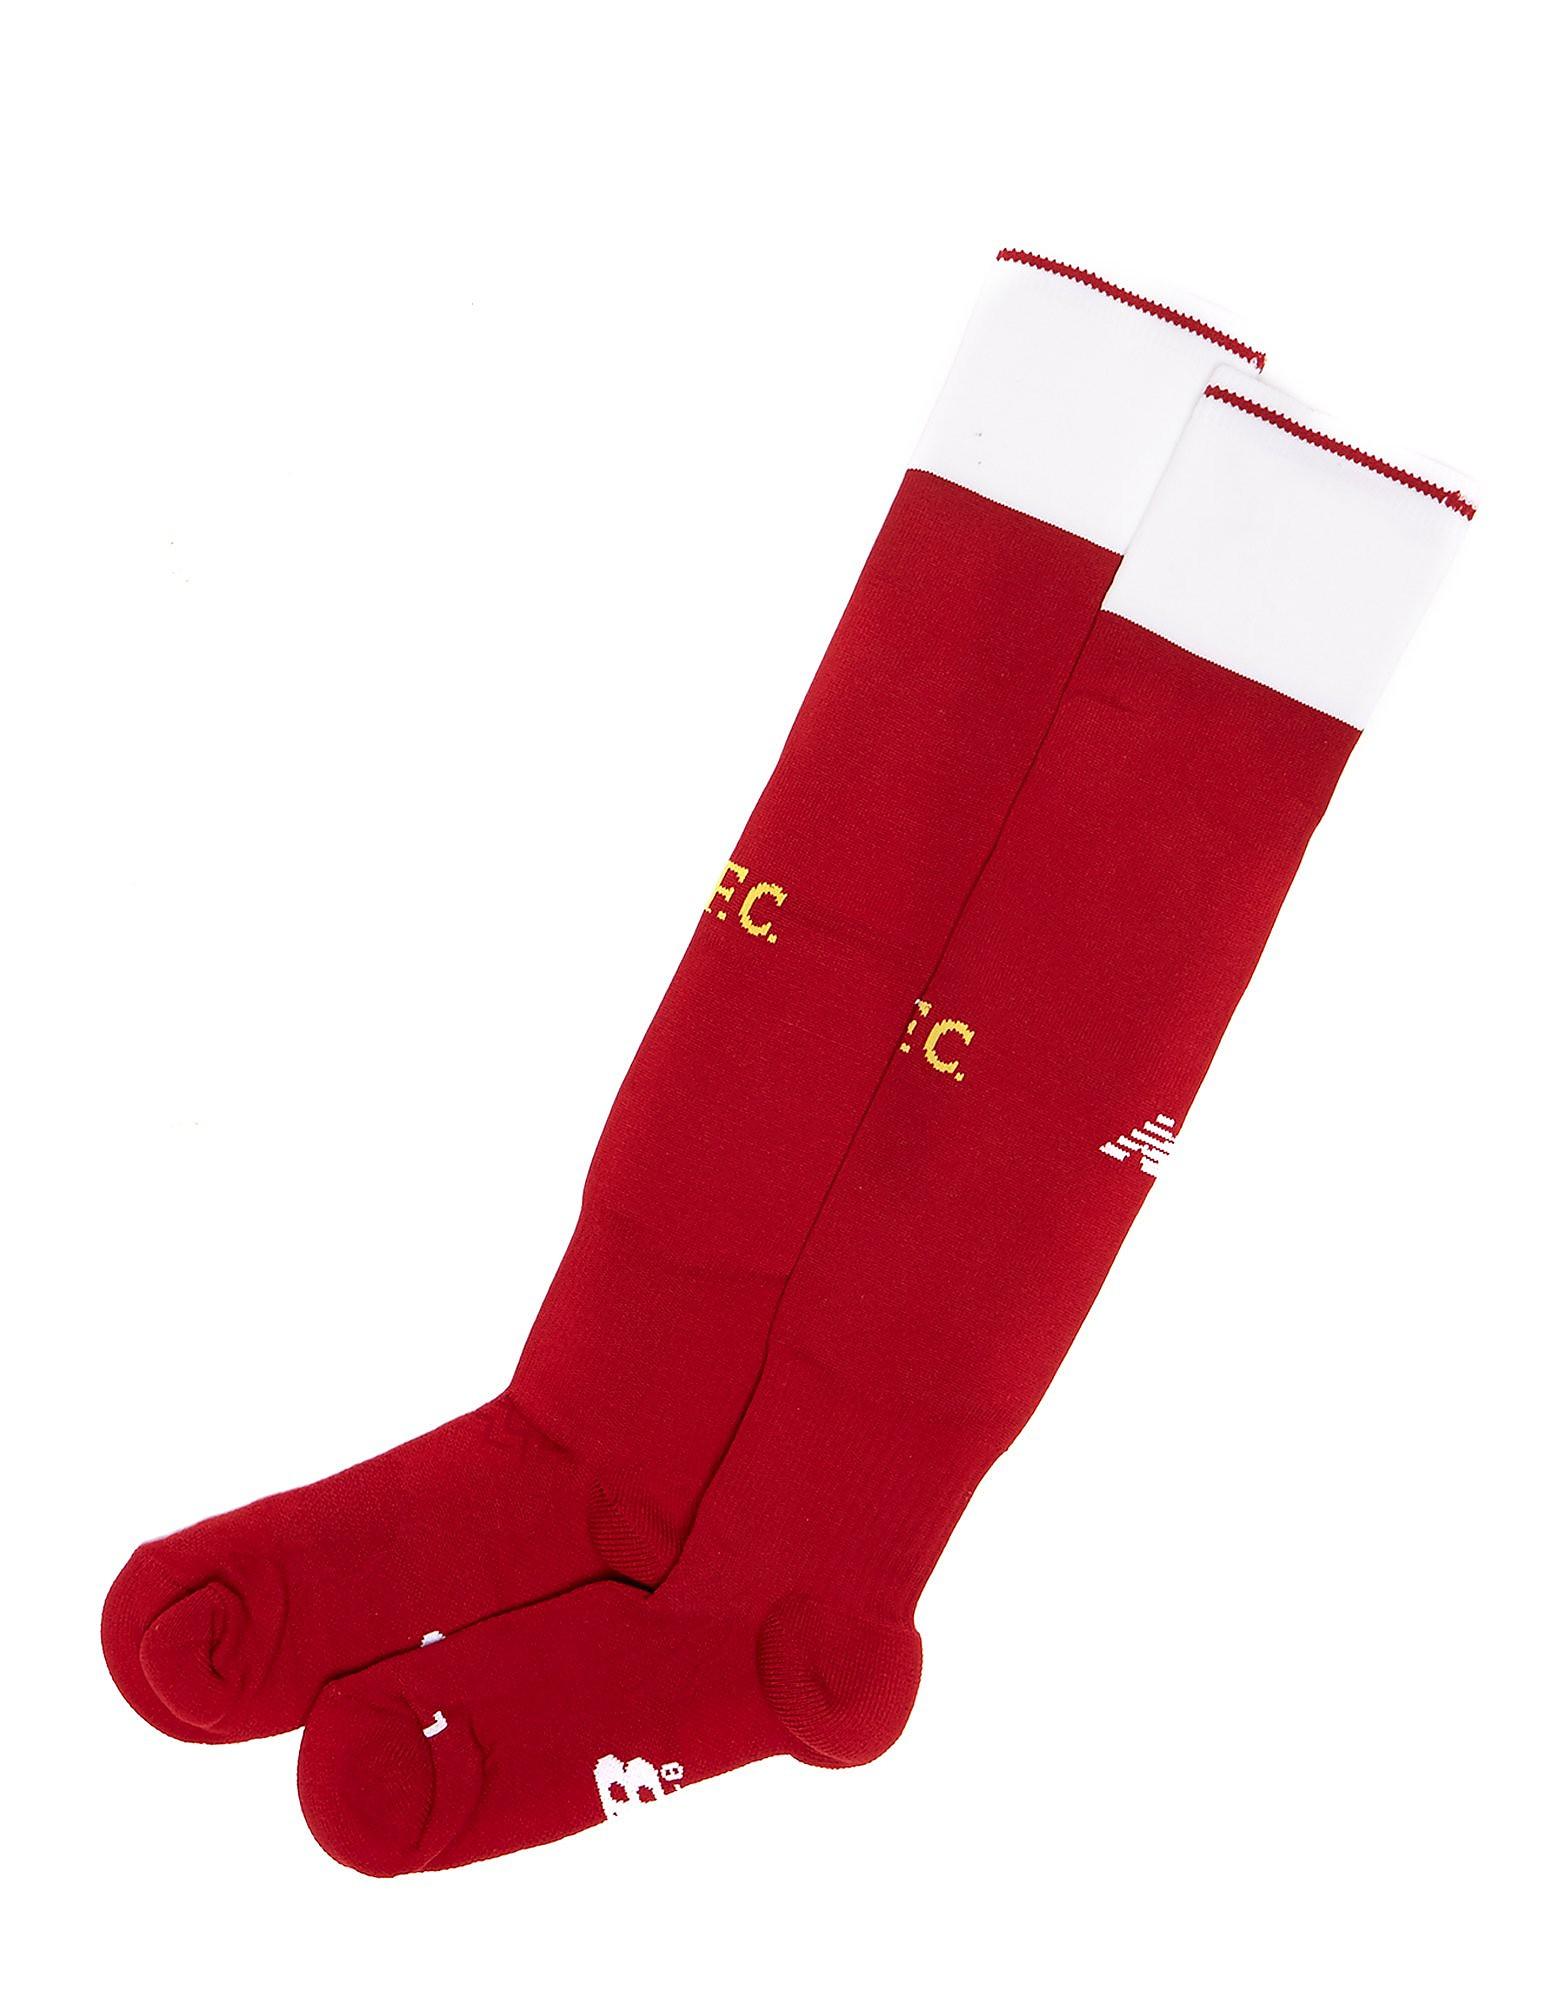 New Balance Liverpool FC 2017/18 Home Socks PRE ORDER